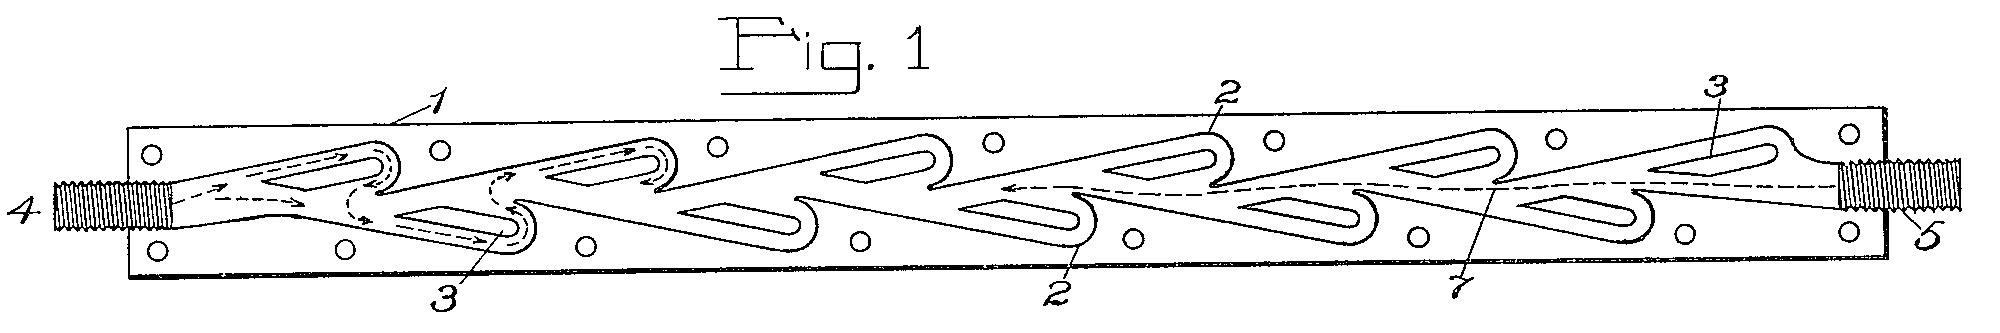 Original Tesla Fluid Valve patent ref.  en.wikipedia.org/wiki/Tesla_valve